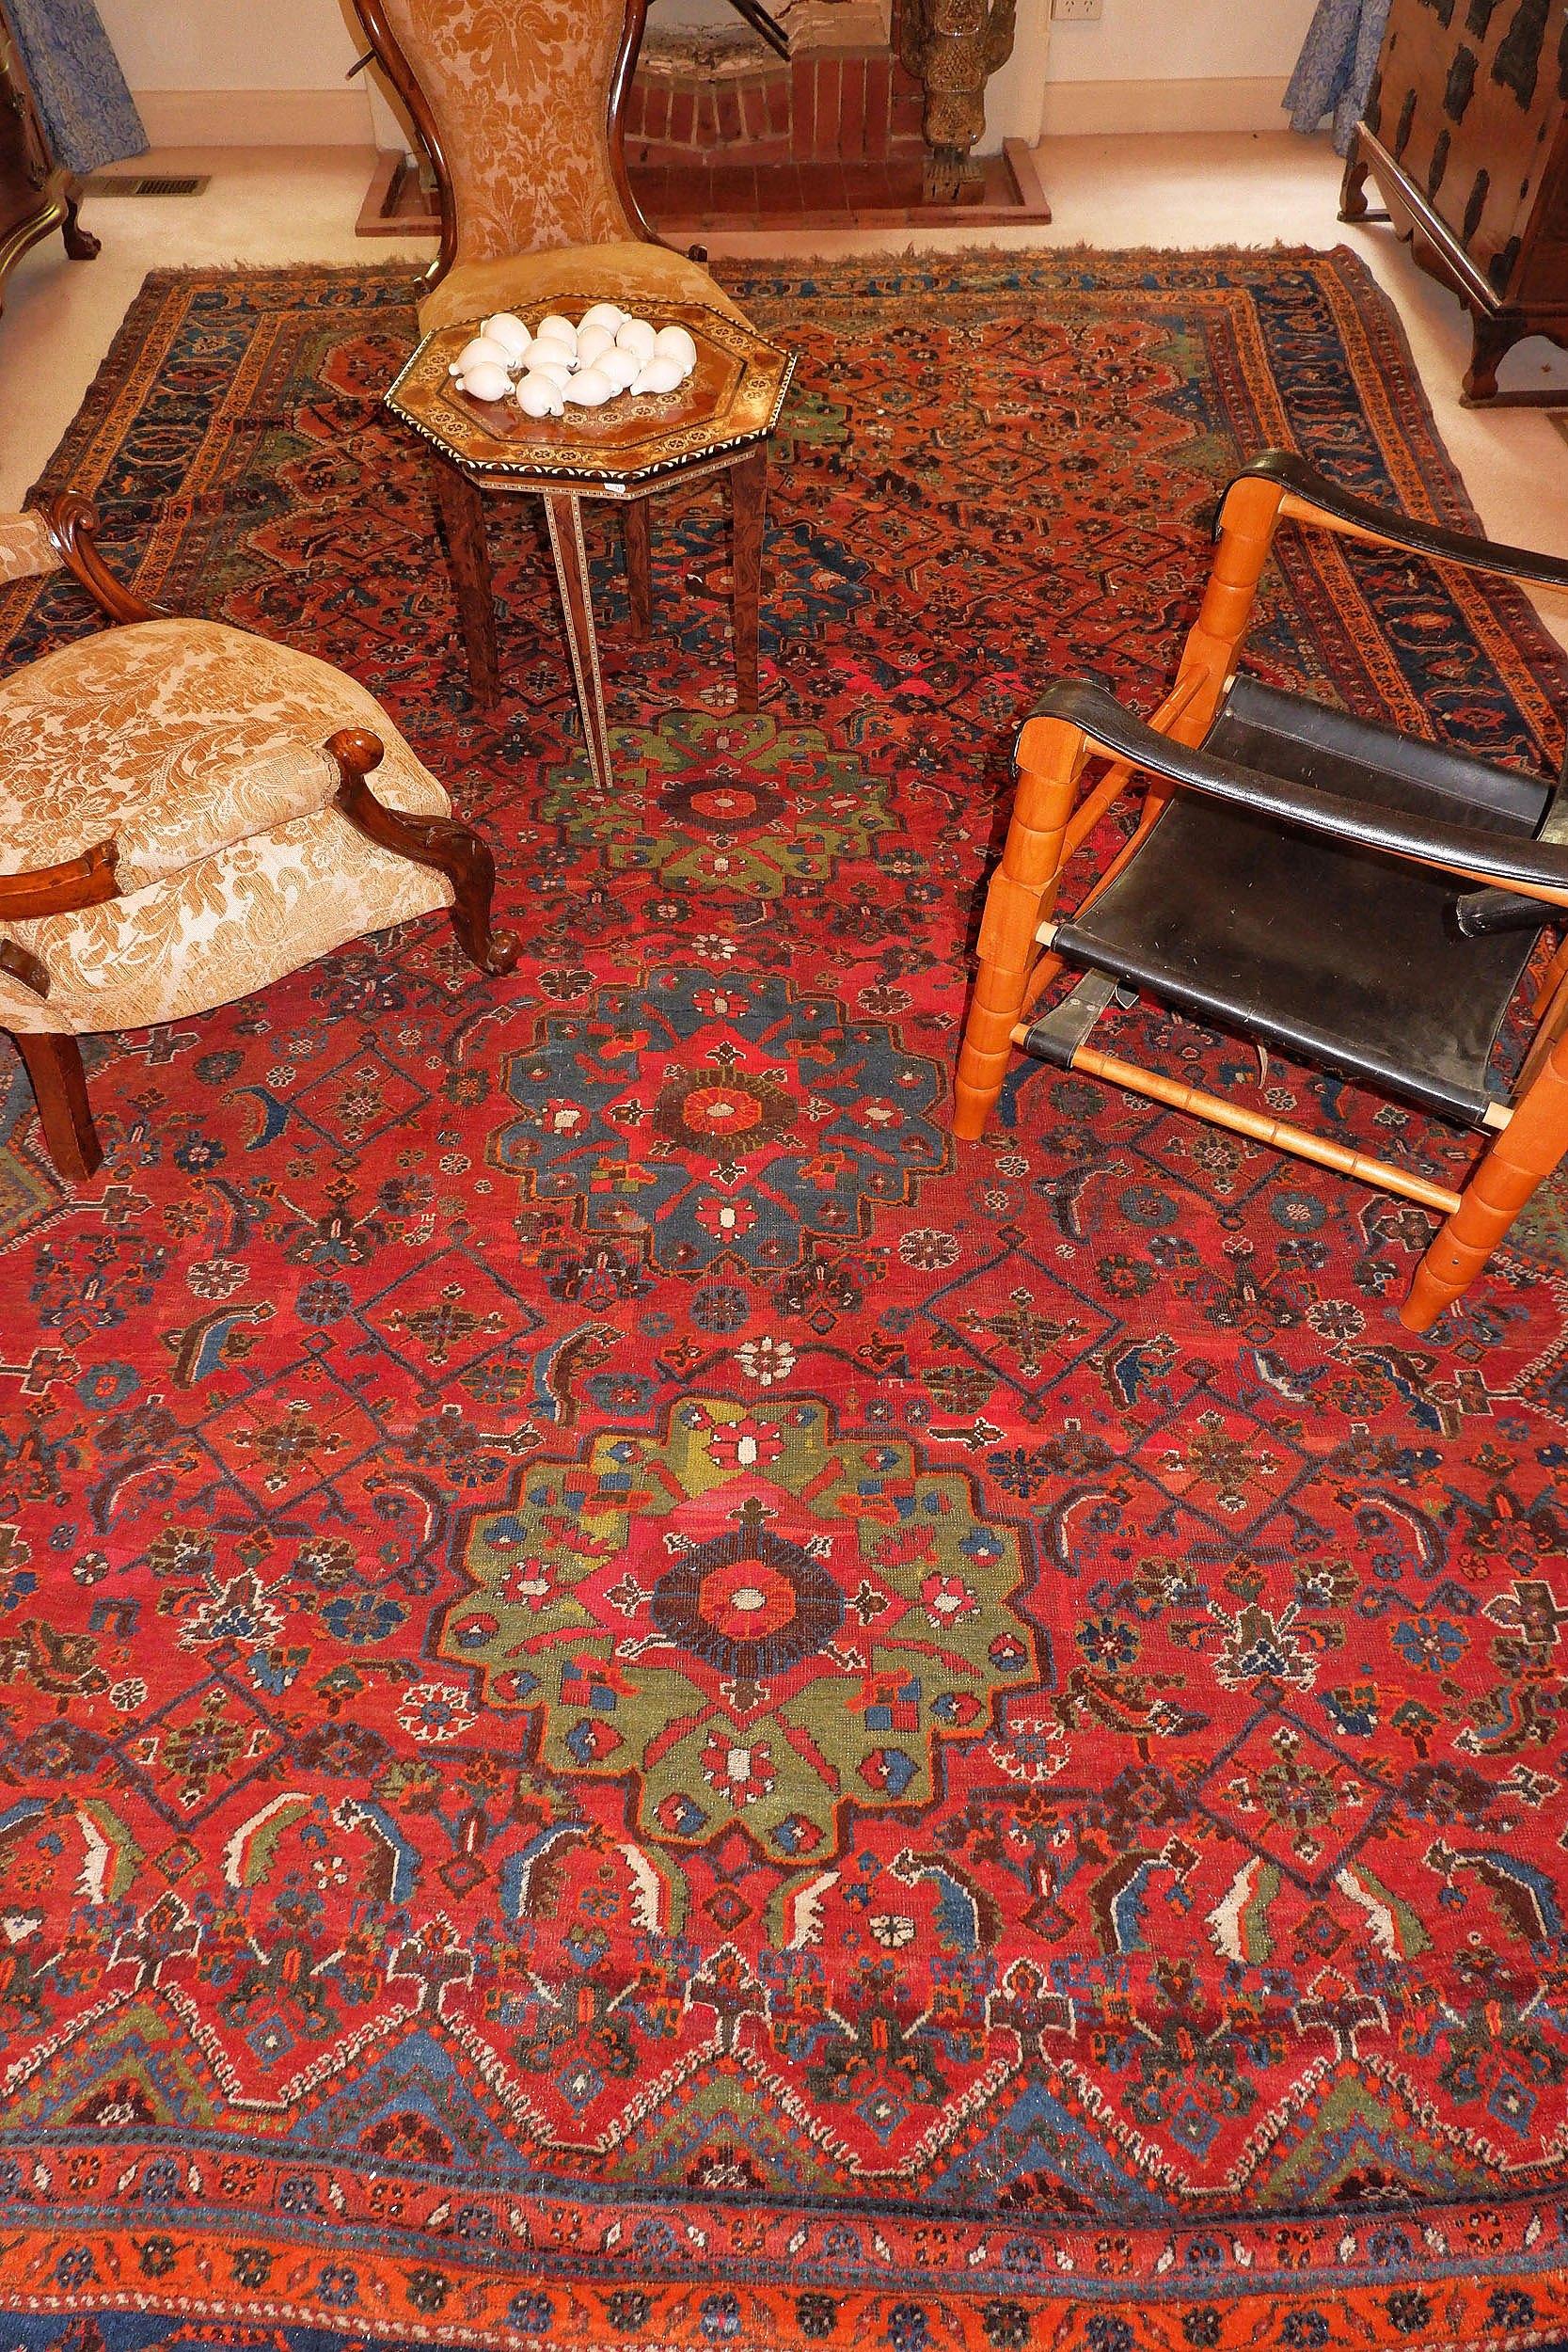 'Fine Semi-Antique Persian Qashqai Carpet'